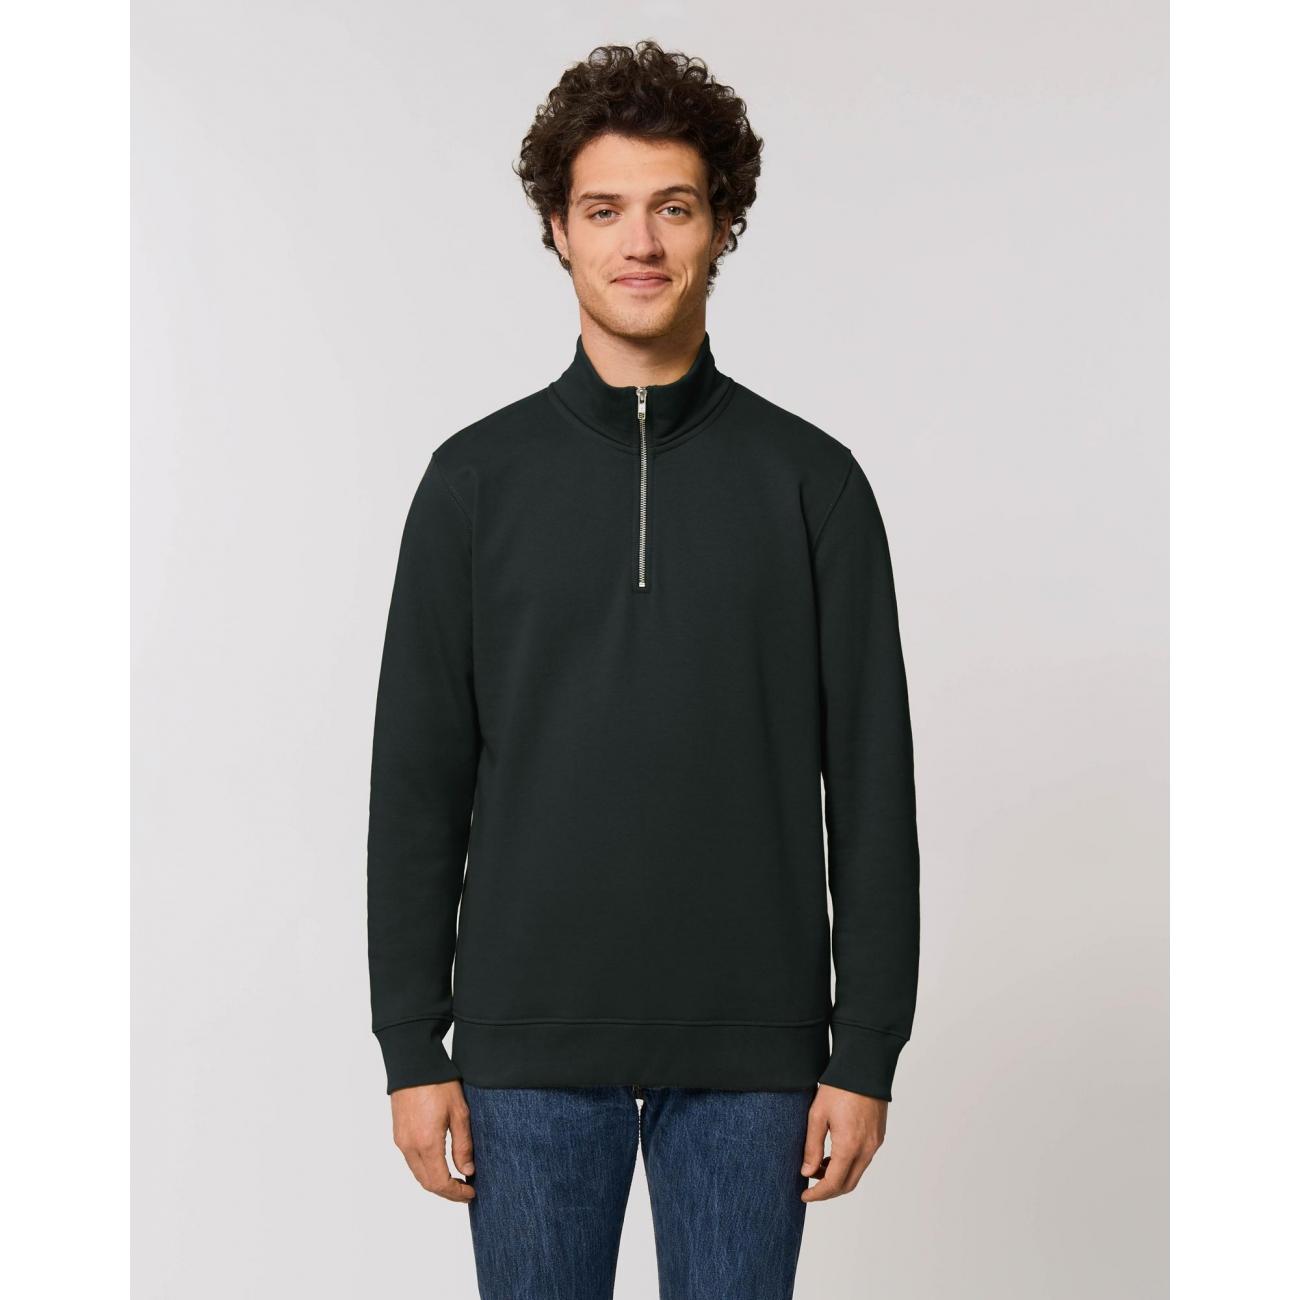 https://tee-shirt-bio.com/8522-thickbox_default/sweat-shirt-col-zippee-montant-homme-noir-coton-bio-.jpg